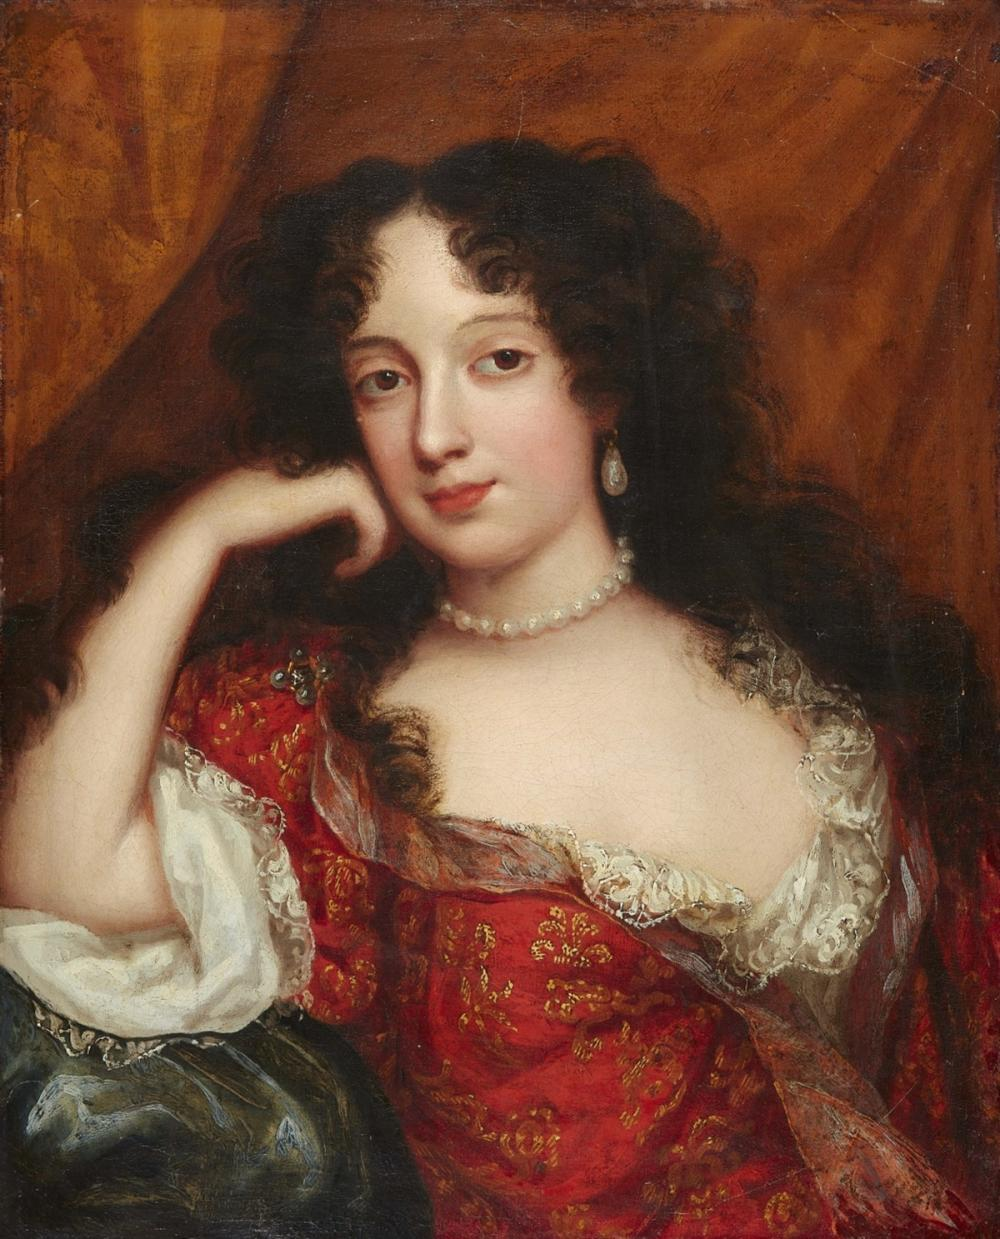 Französische Schule des 17. Jahrhunderts, Wohl Portrait von Marie Casimire Louise de la Grange d'Arquien, spätere Königin von Polen, Öl/Lwd. | Foto: Lempertz